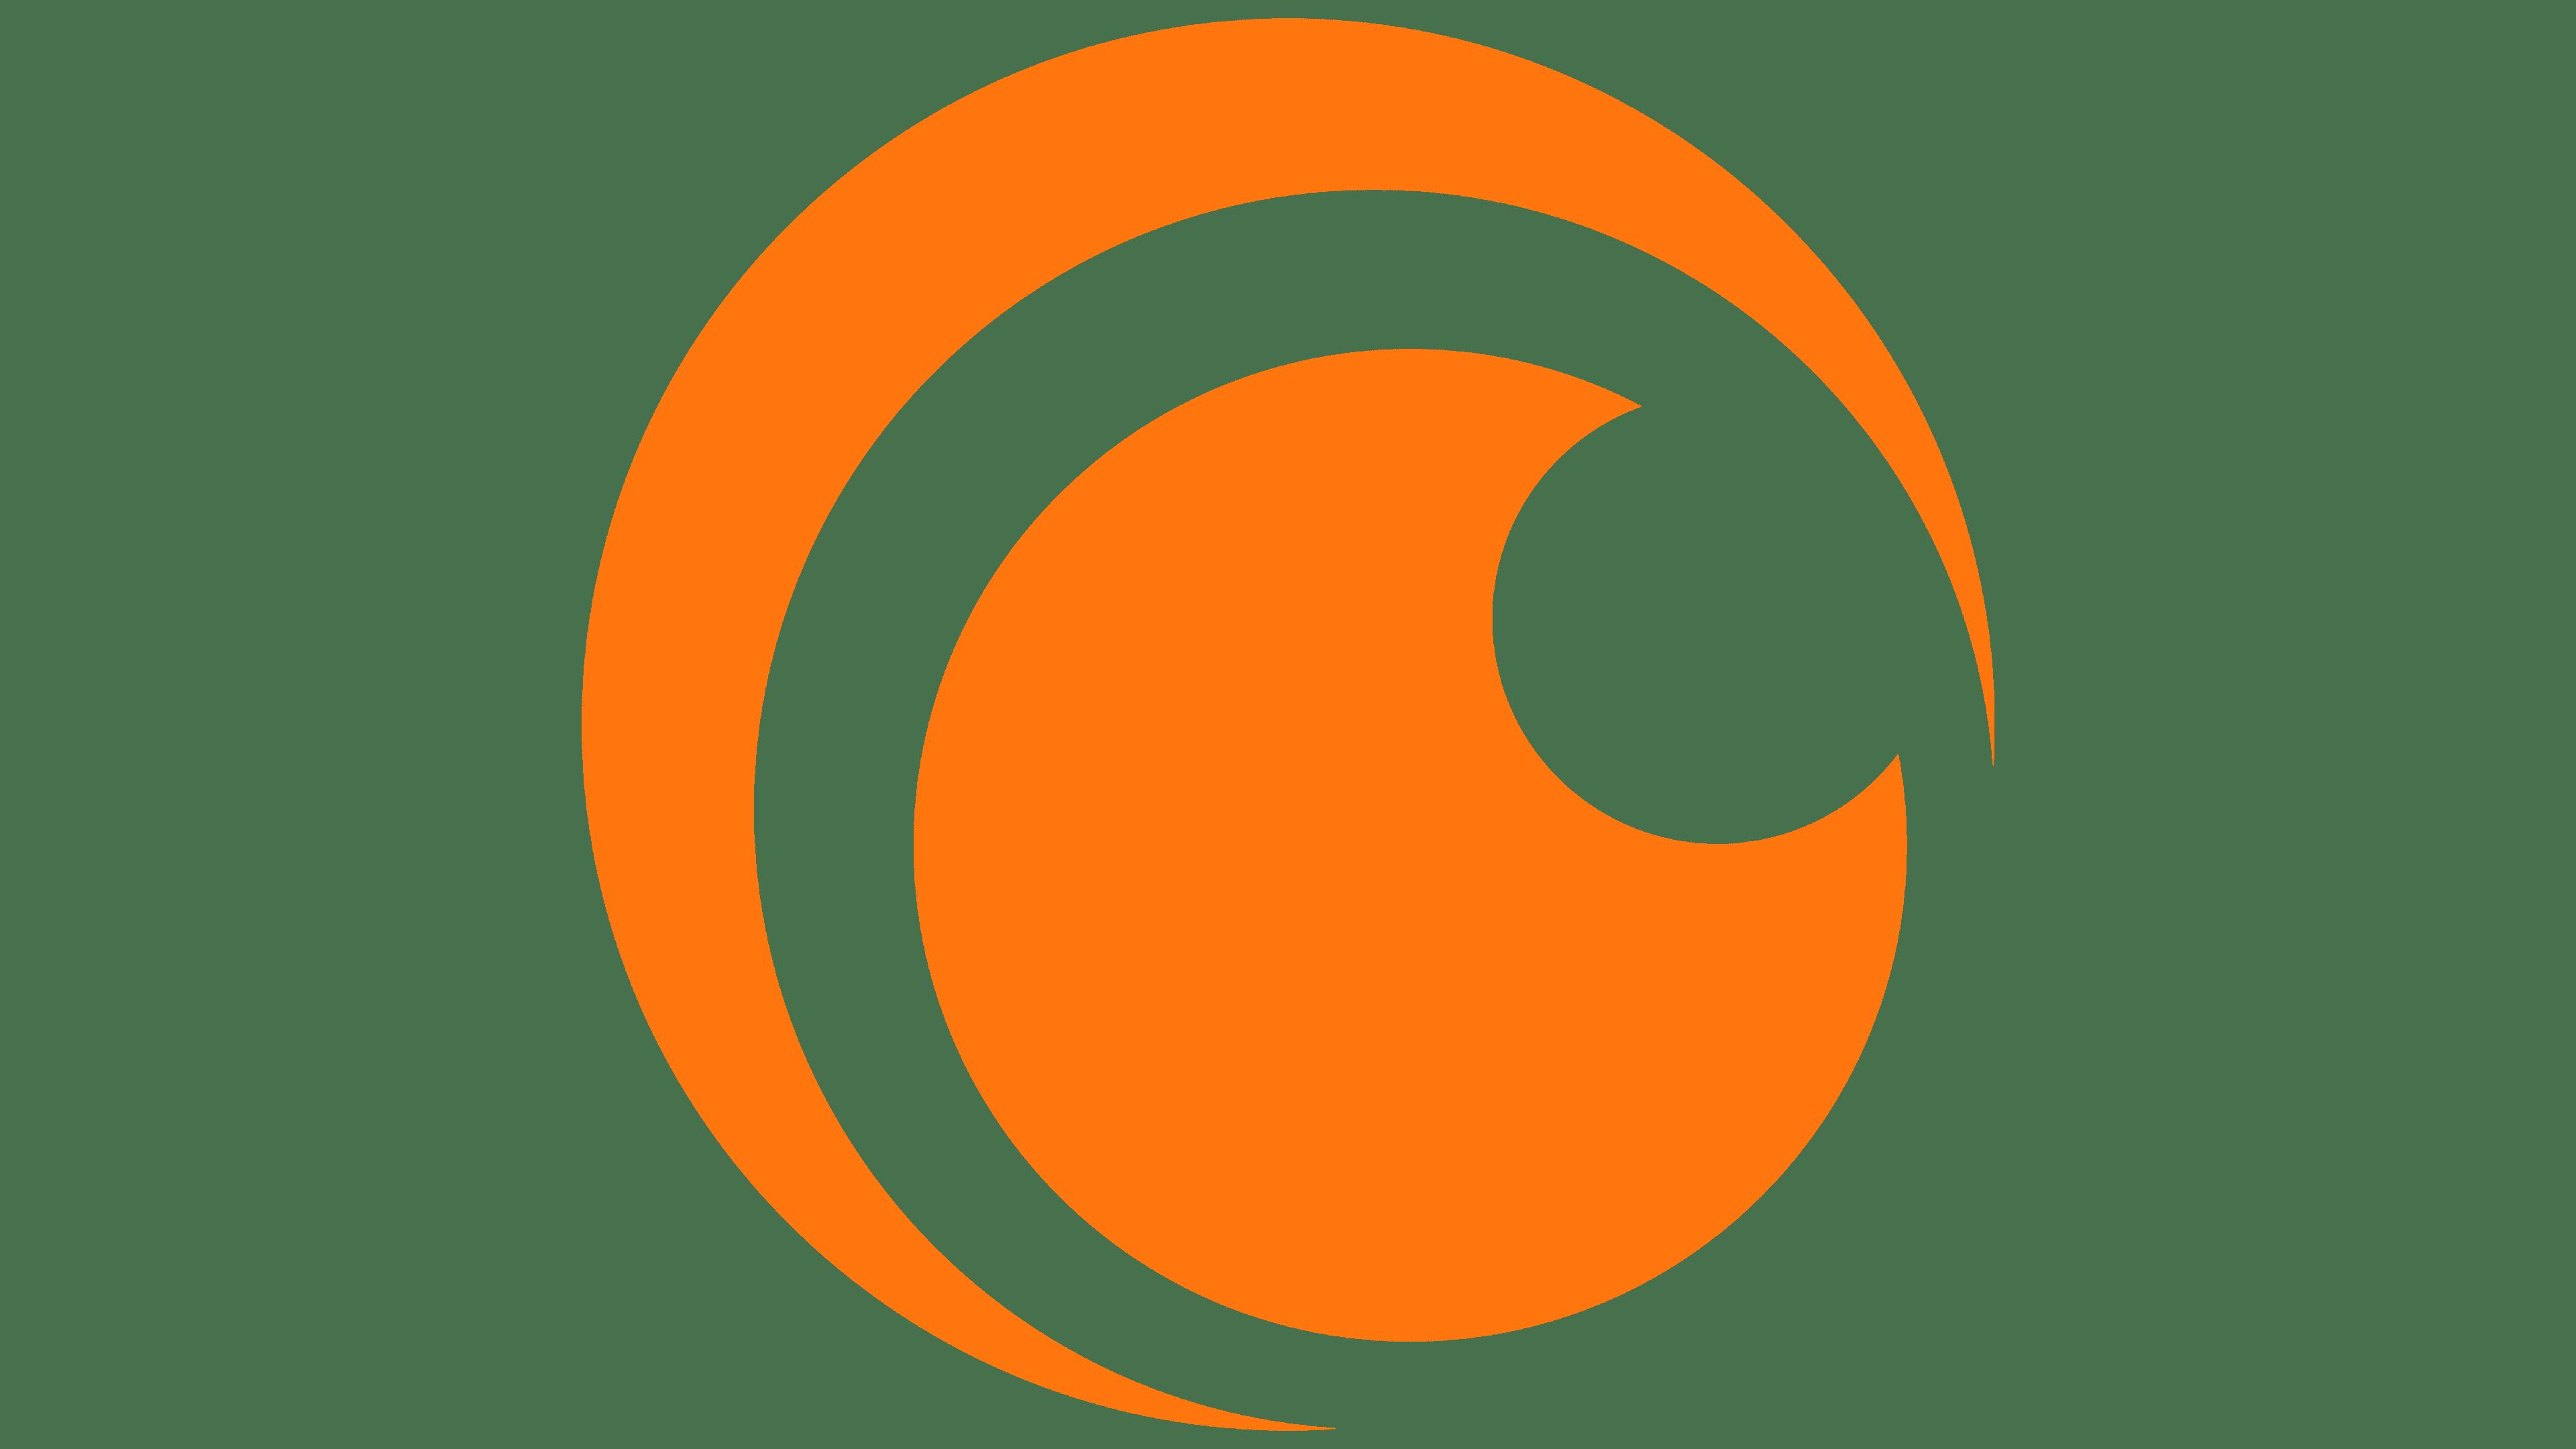 Crunchyroll Logo | Symbol, History, PNG (3840*2160)